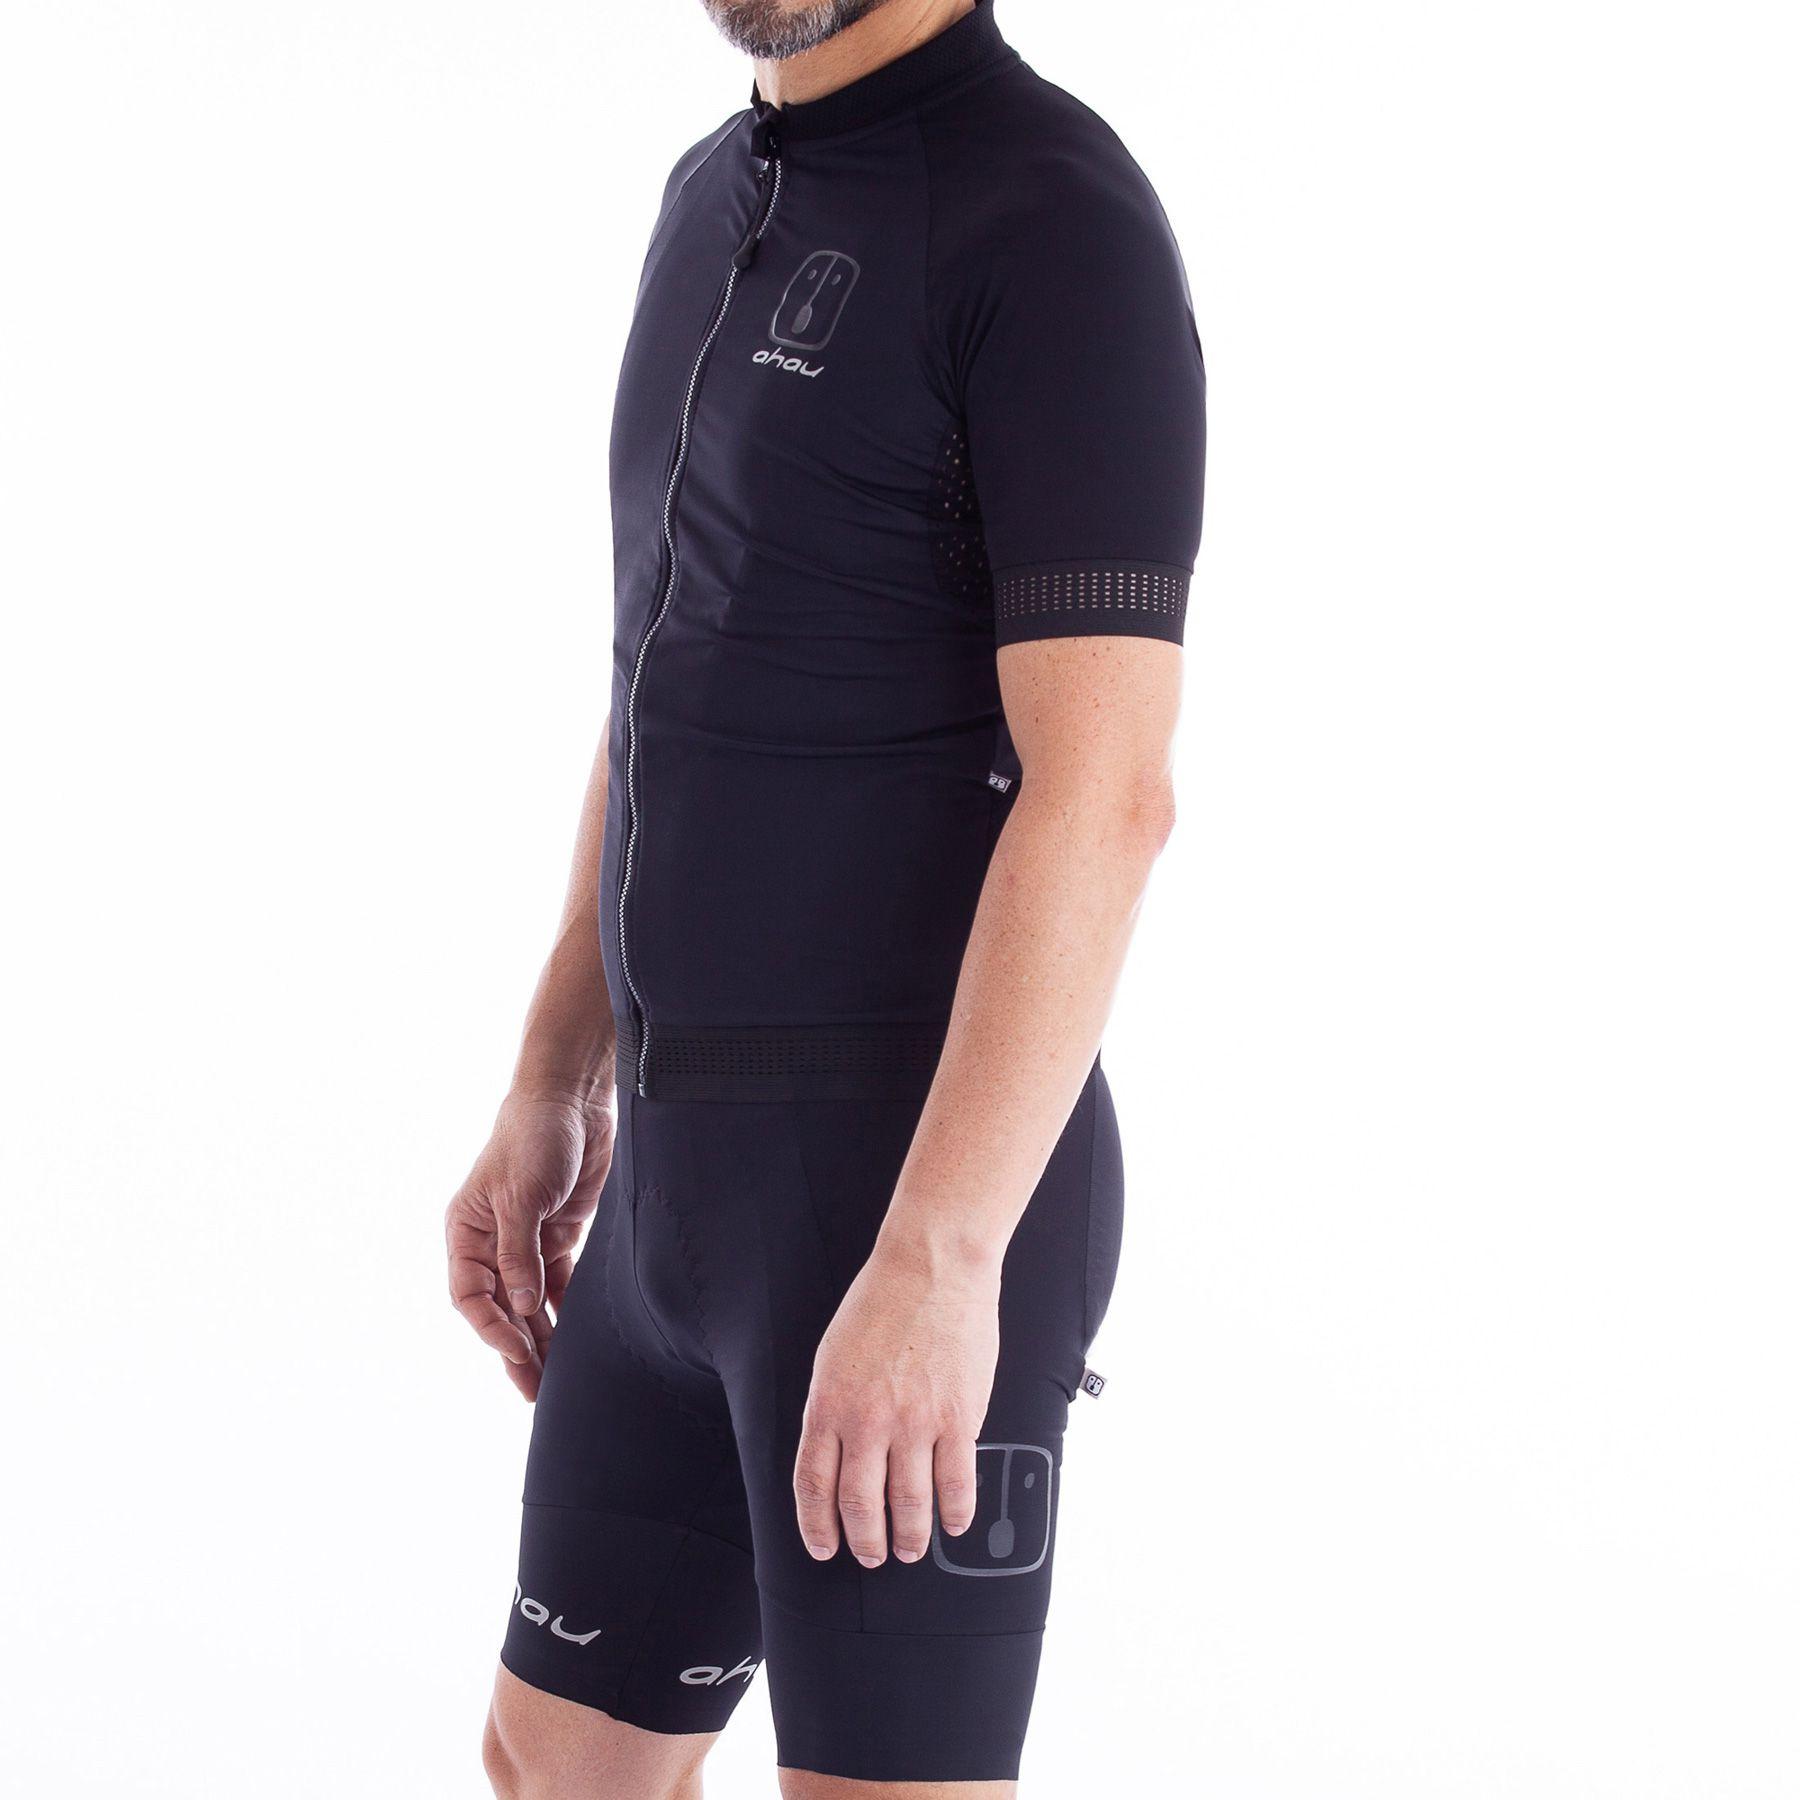 Camisa Ciclismo Black Tie - Masculina